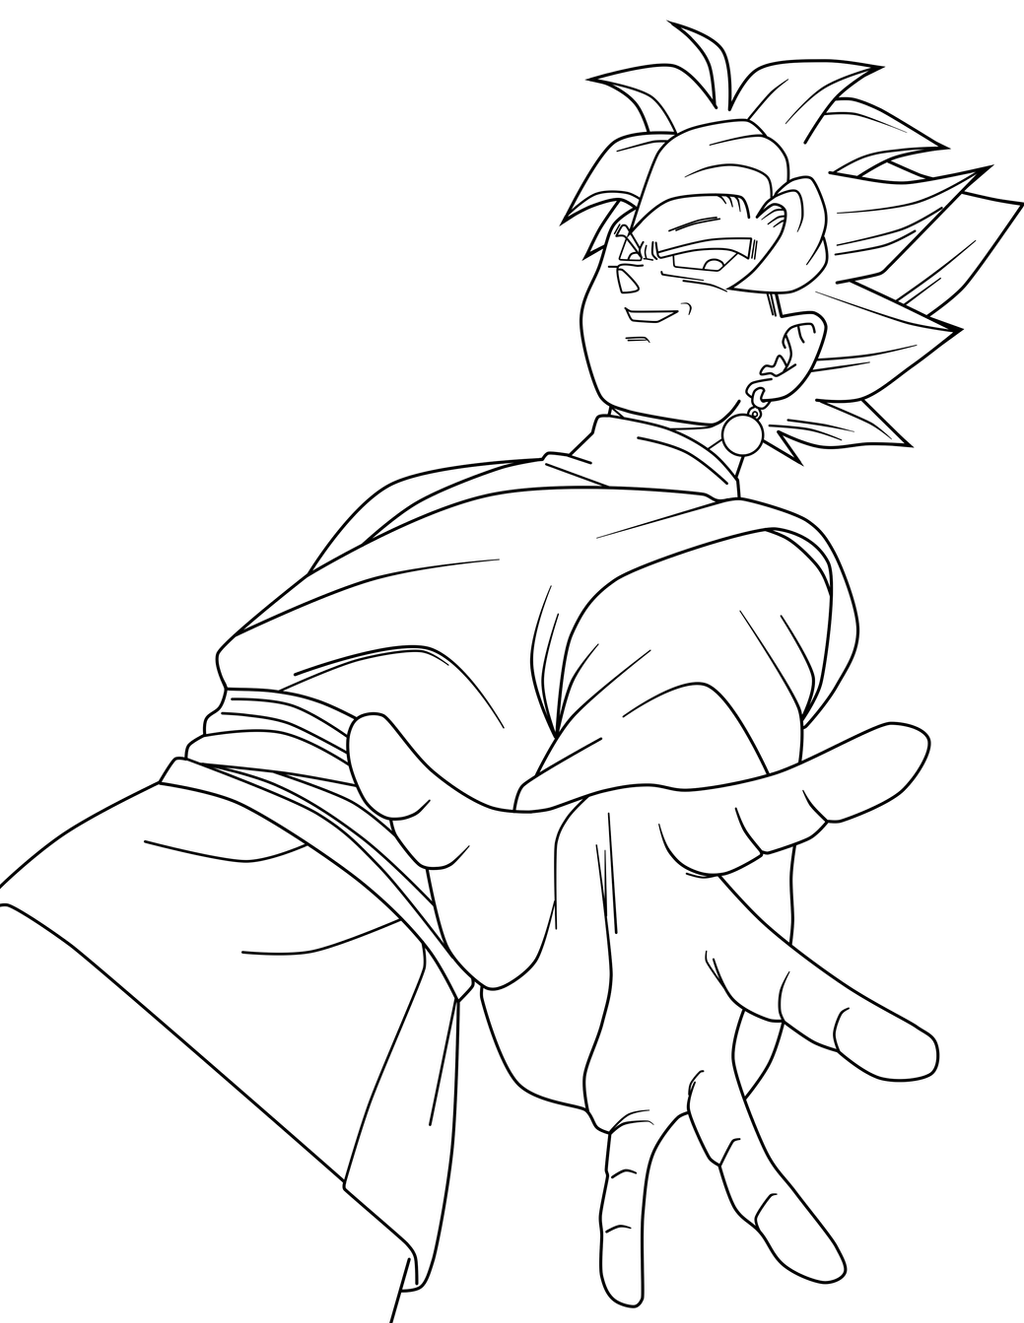 Bonito Goku Para Colorear Imprimible Ideas - Dibujos Para Colorear ...